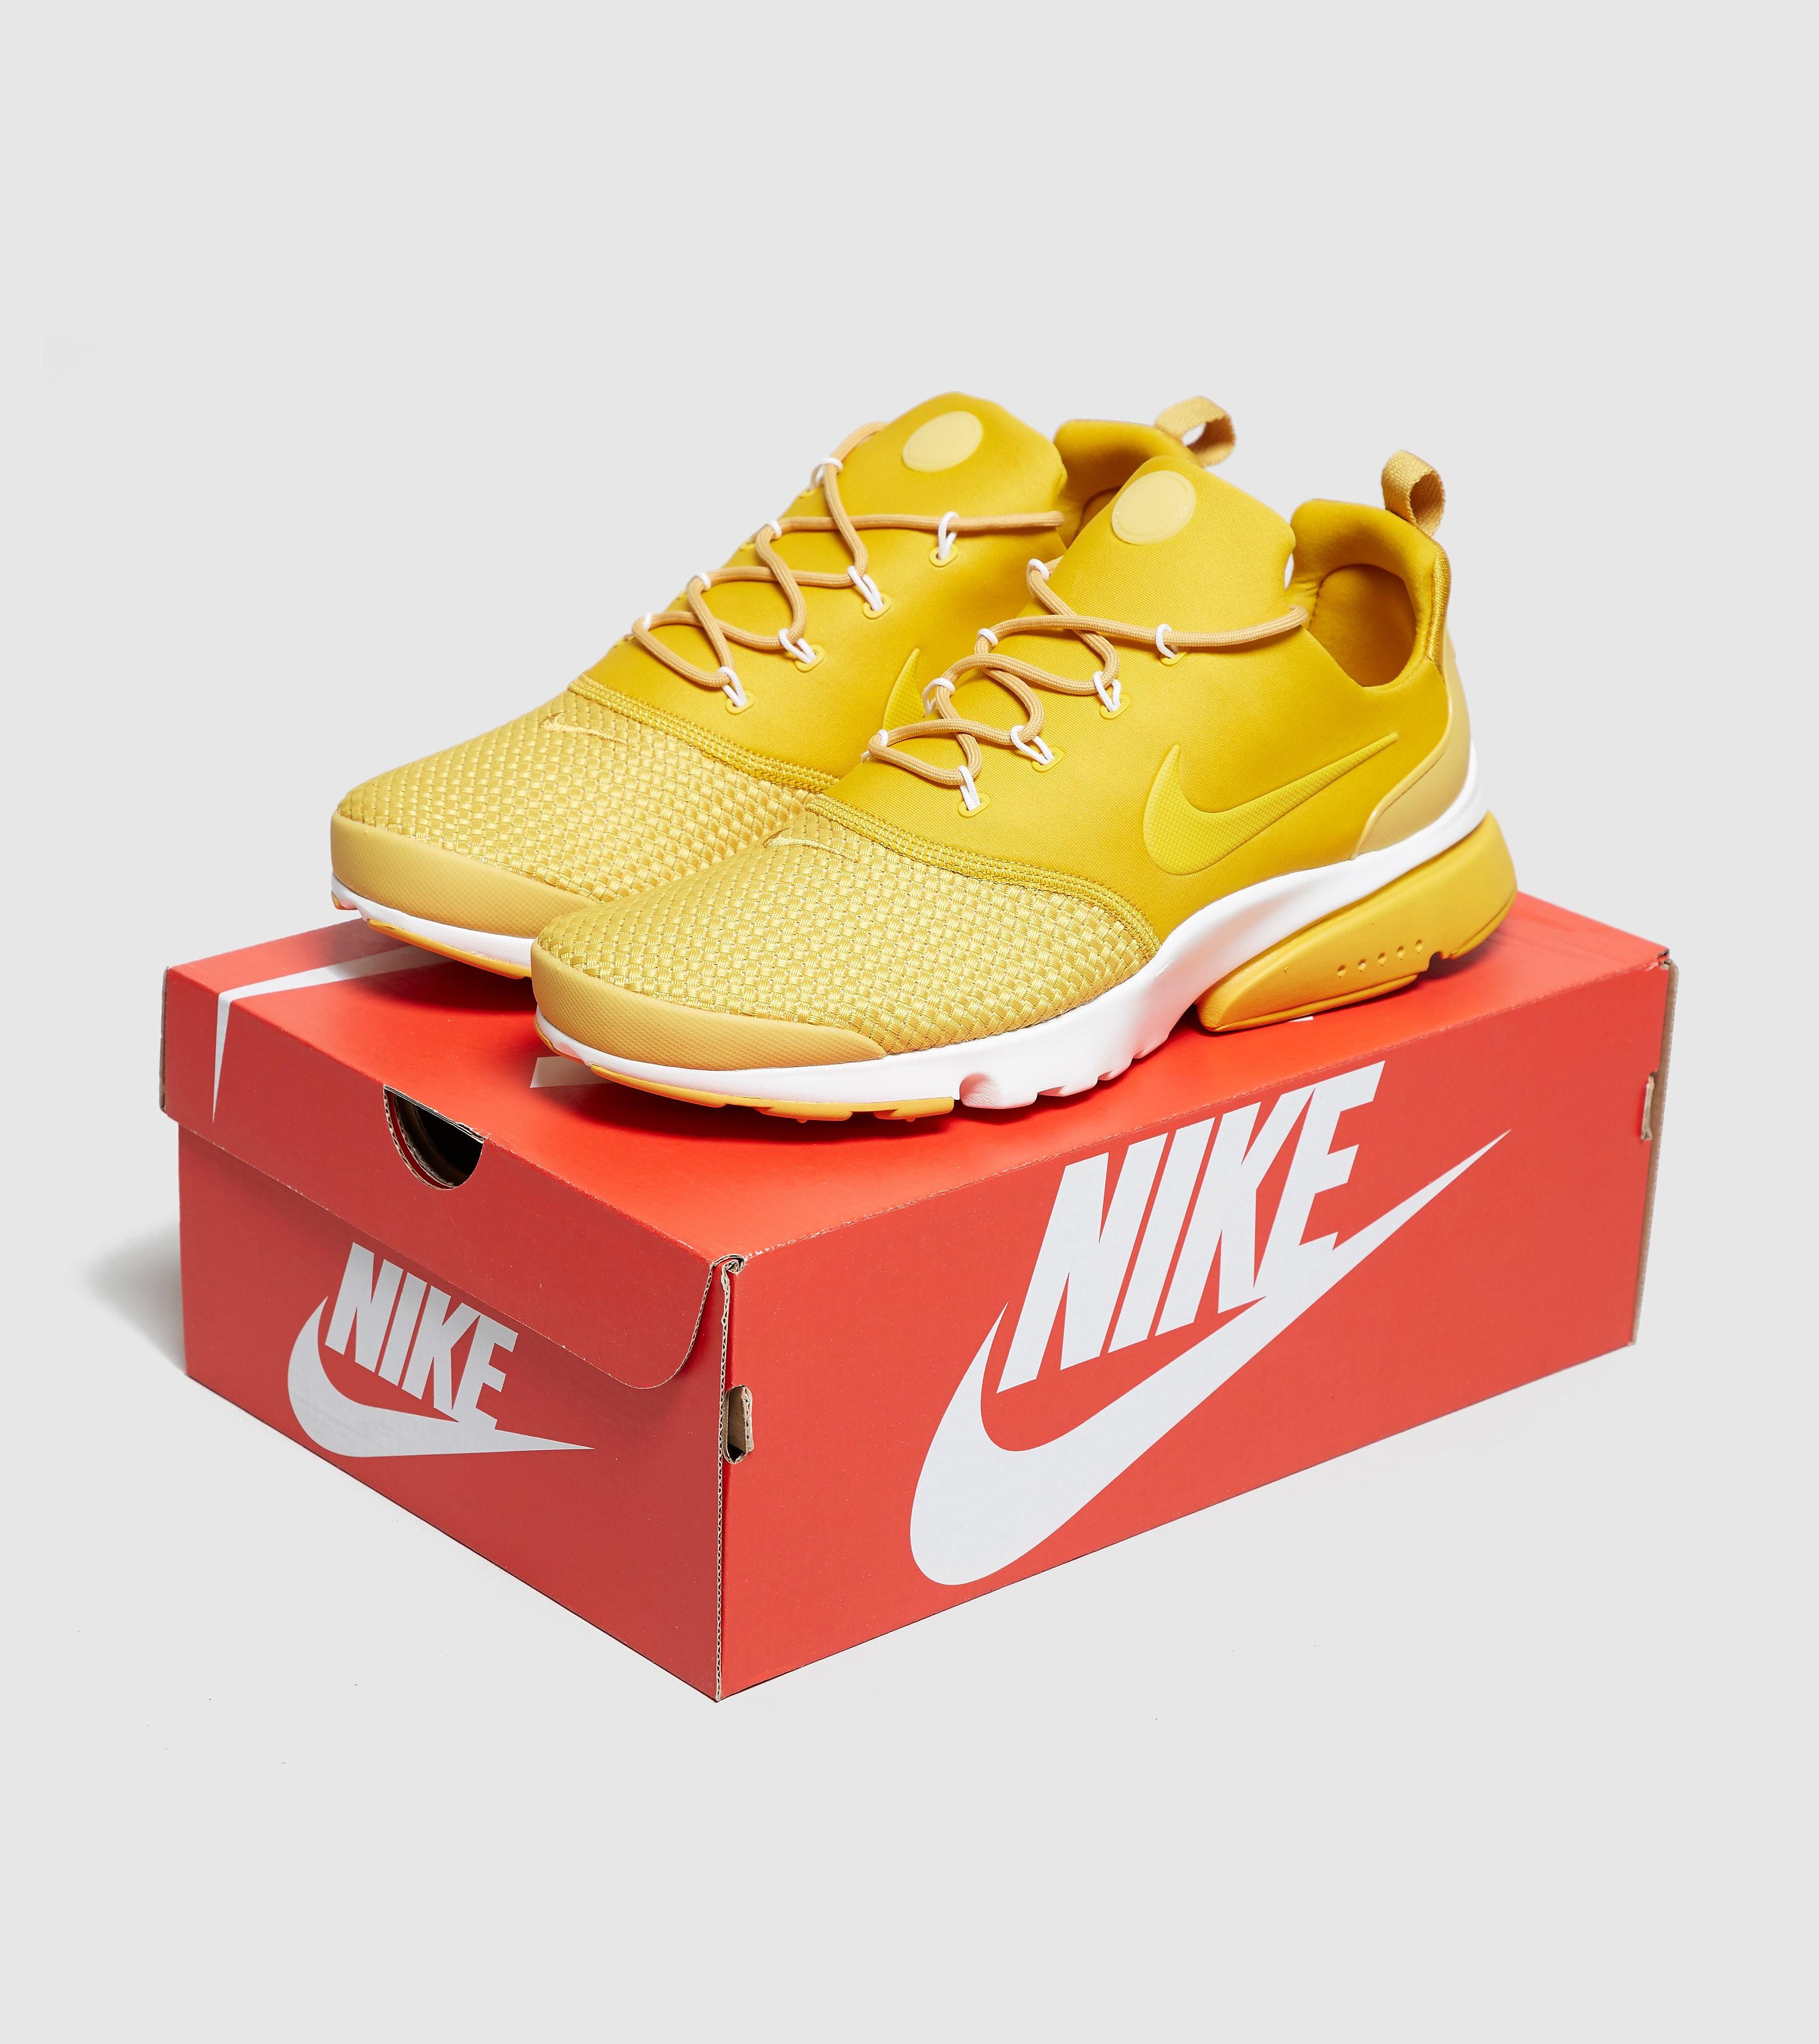 Nike Air Presto Fly Woven